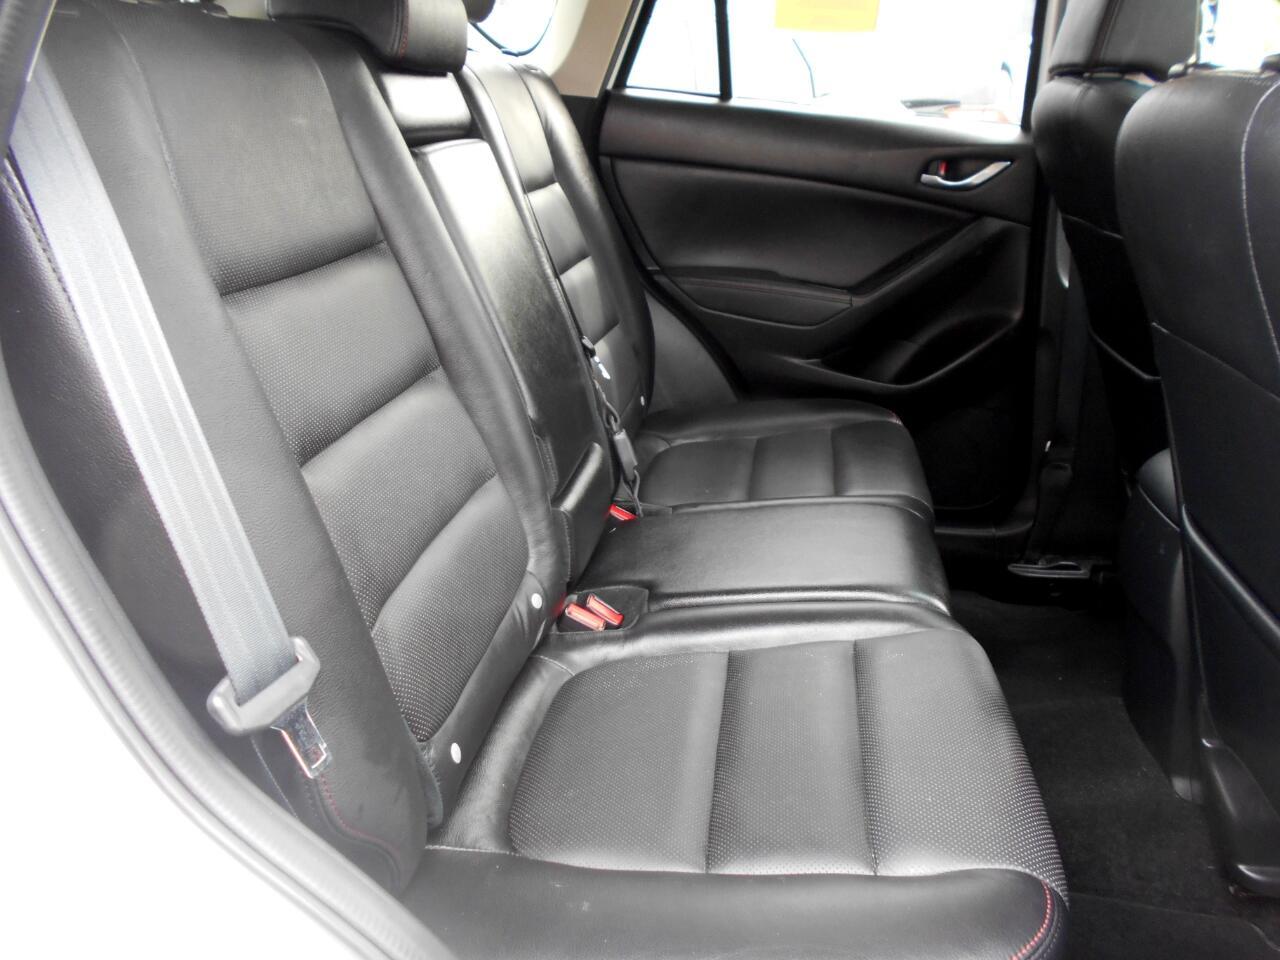 2013 Mazda CX-5 Grand Touring AWD